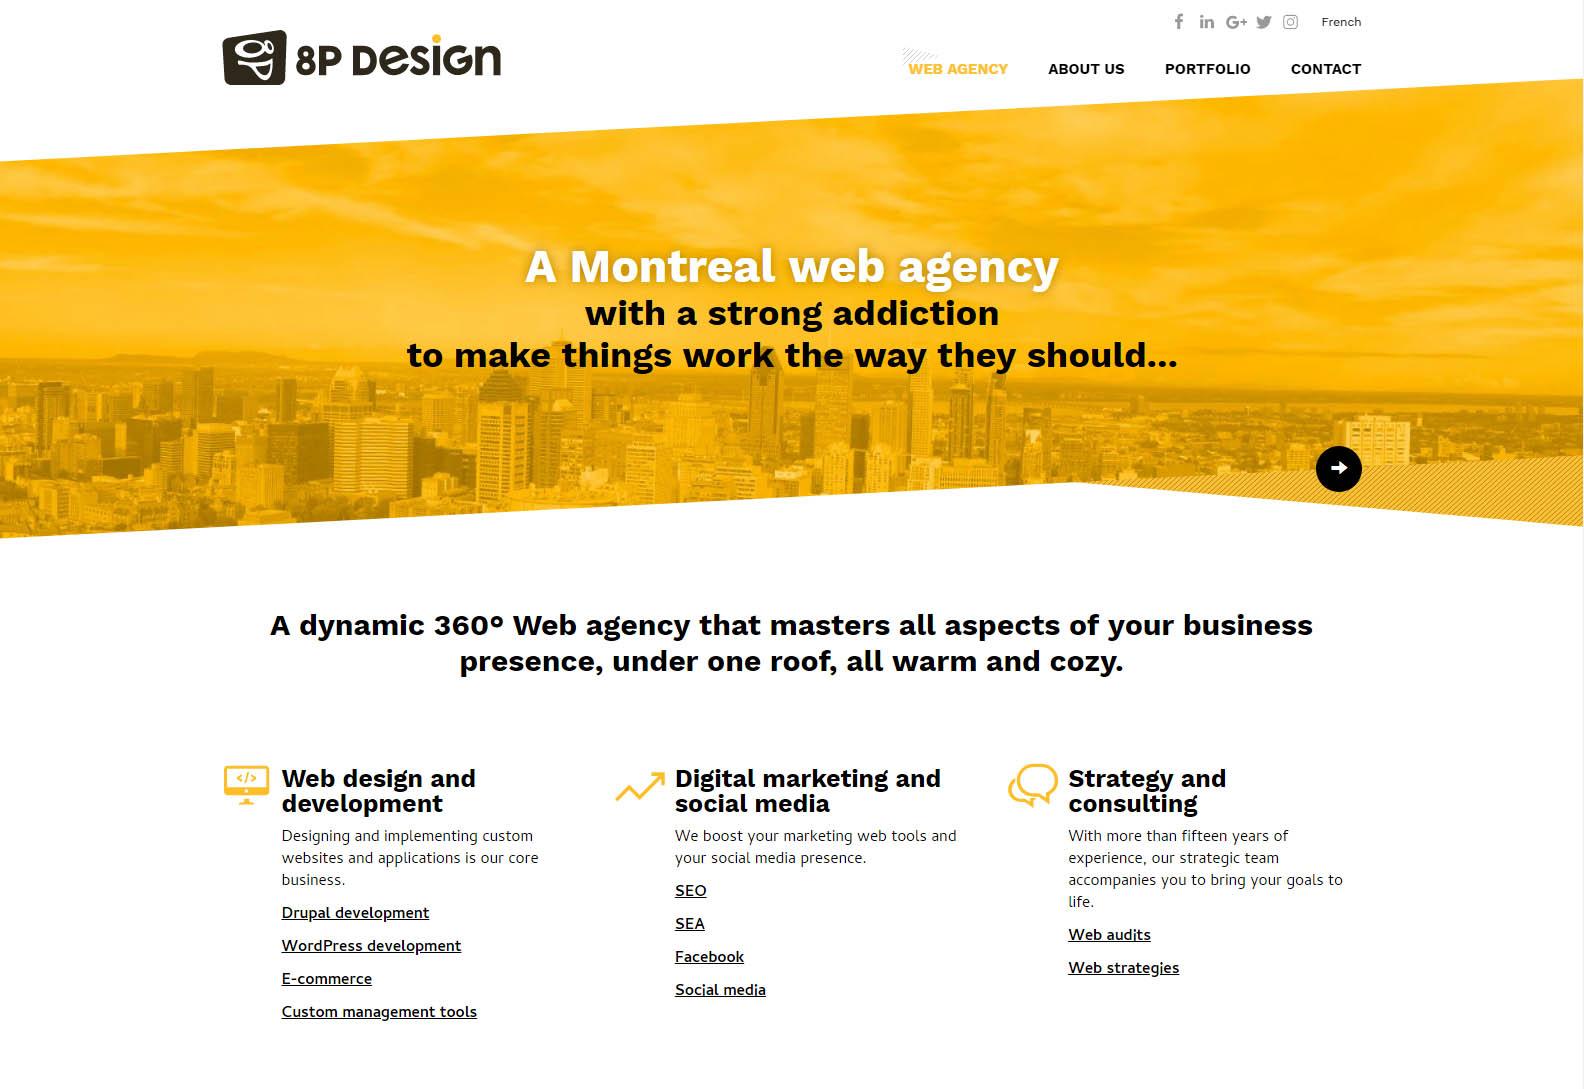 8p design - Web design agencies Montreal